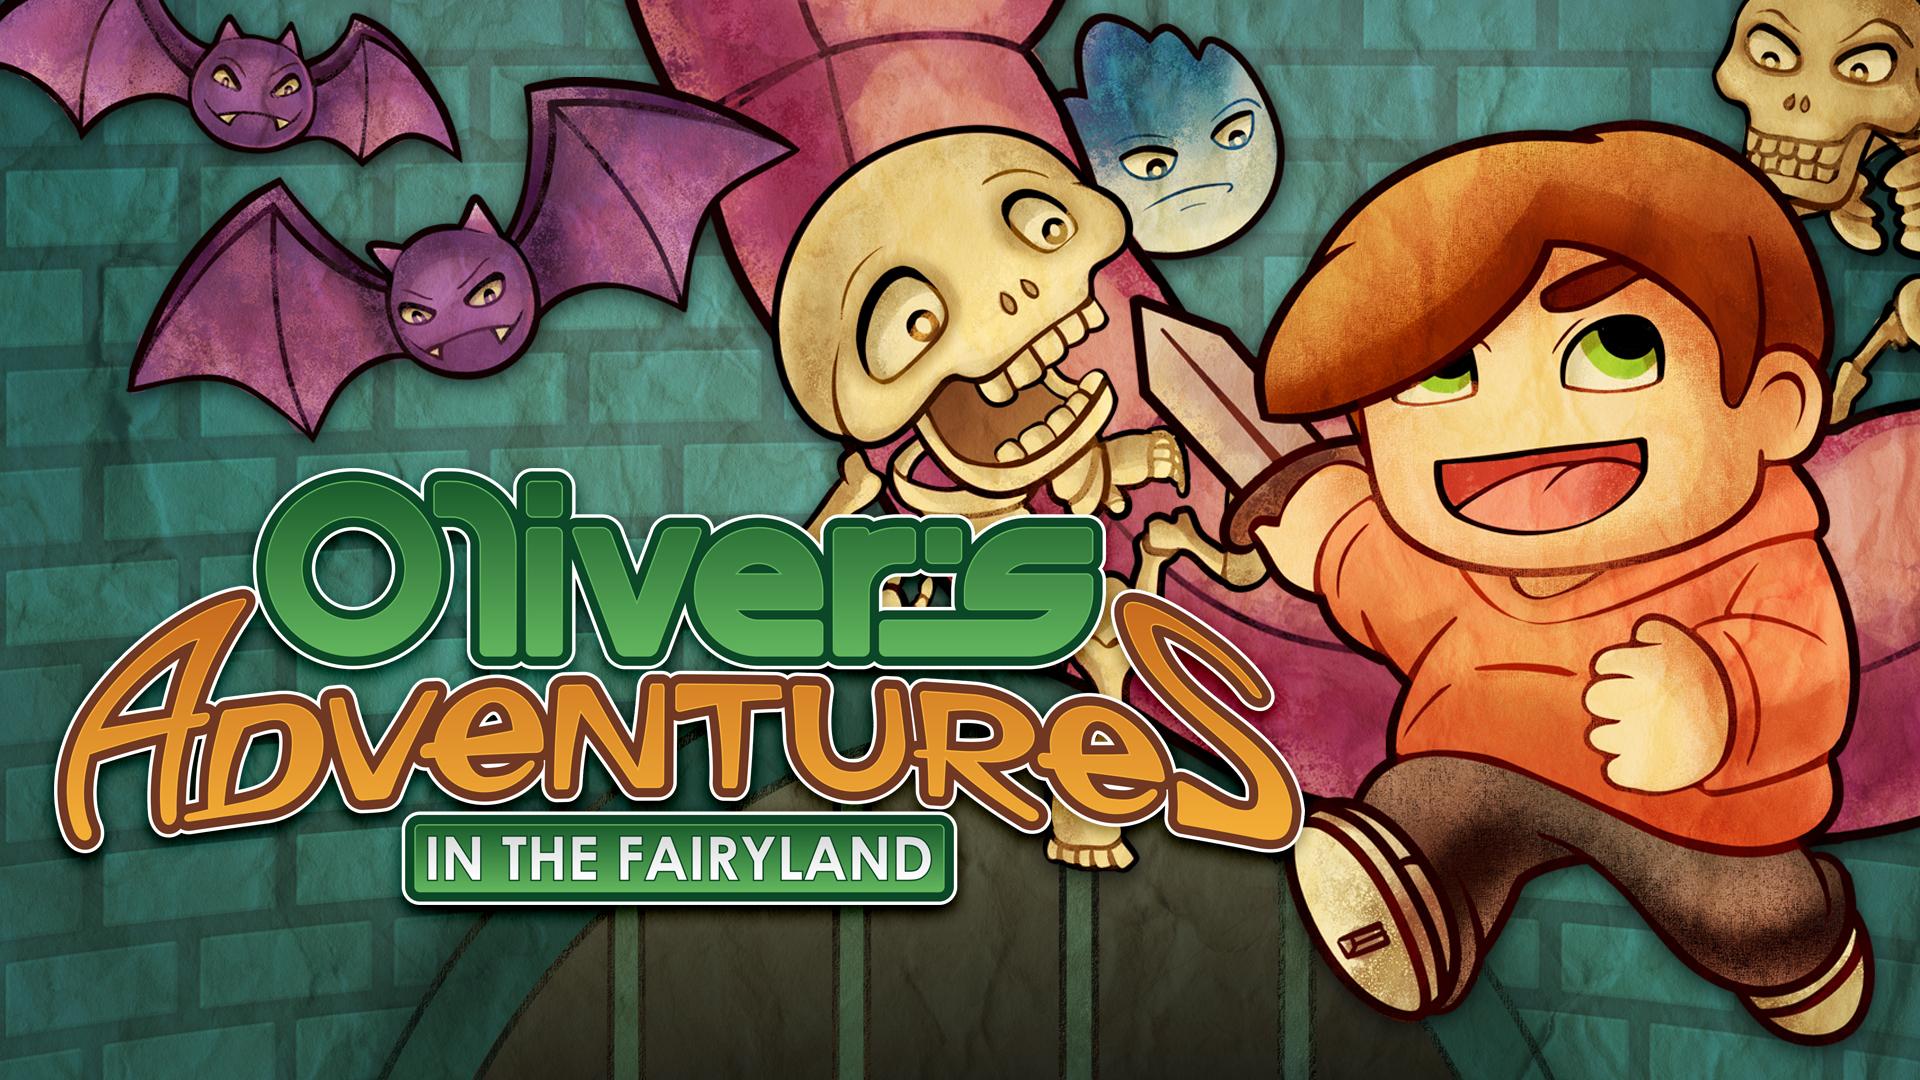 olivers-adventures-in-the-fairyland-switch-hero.jpg